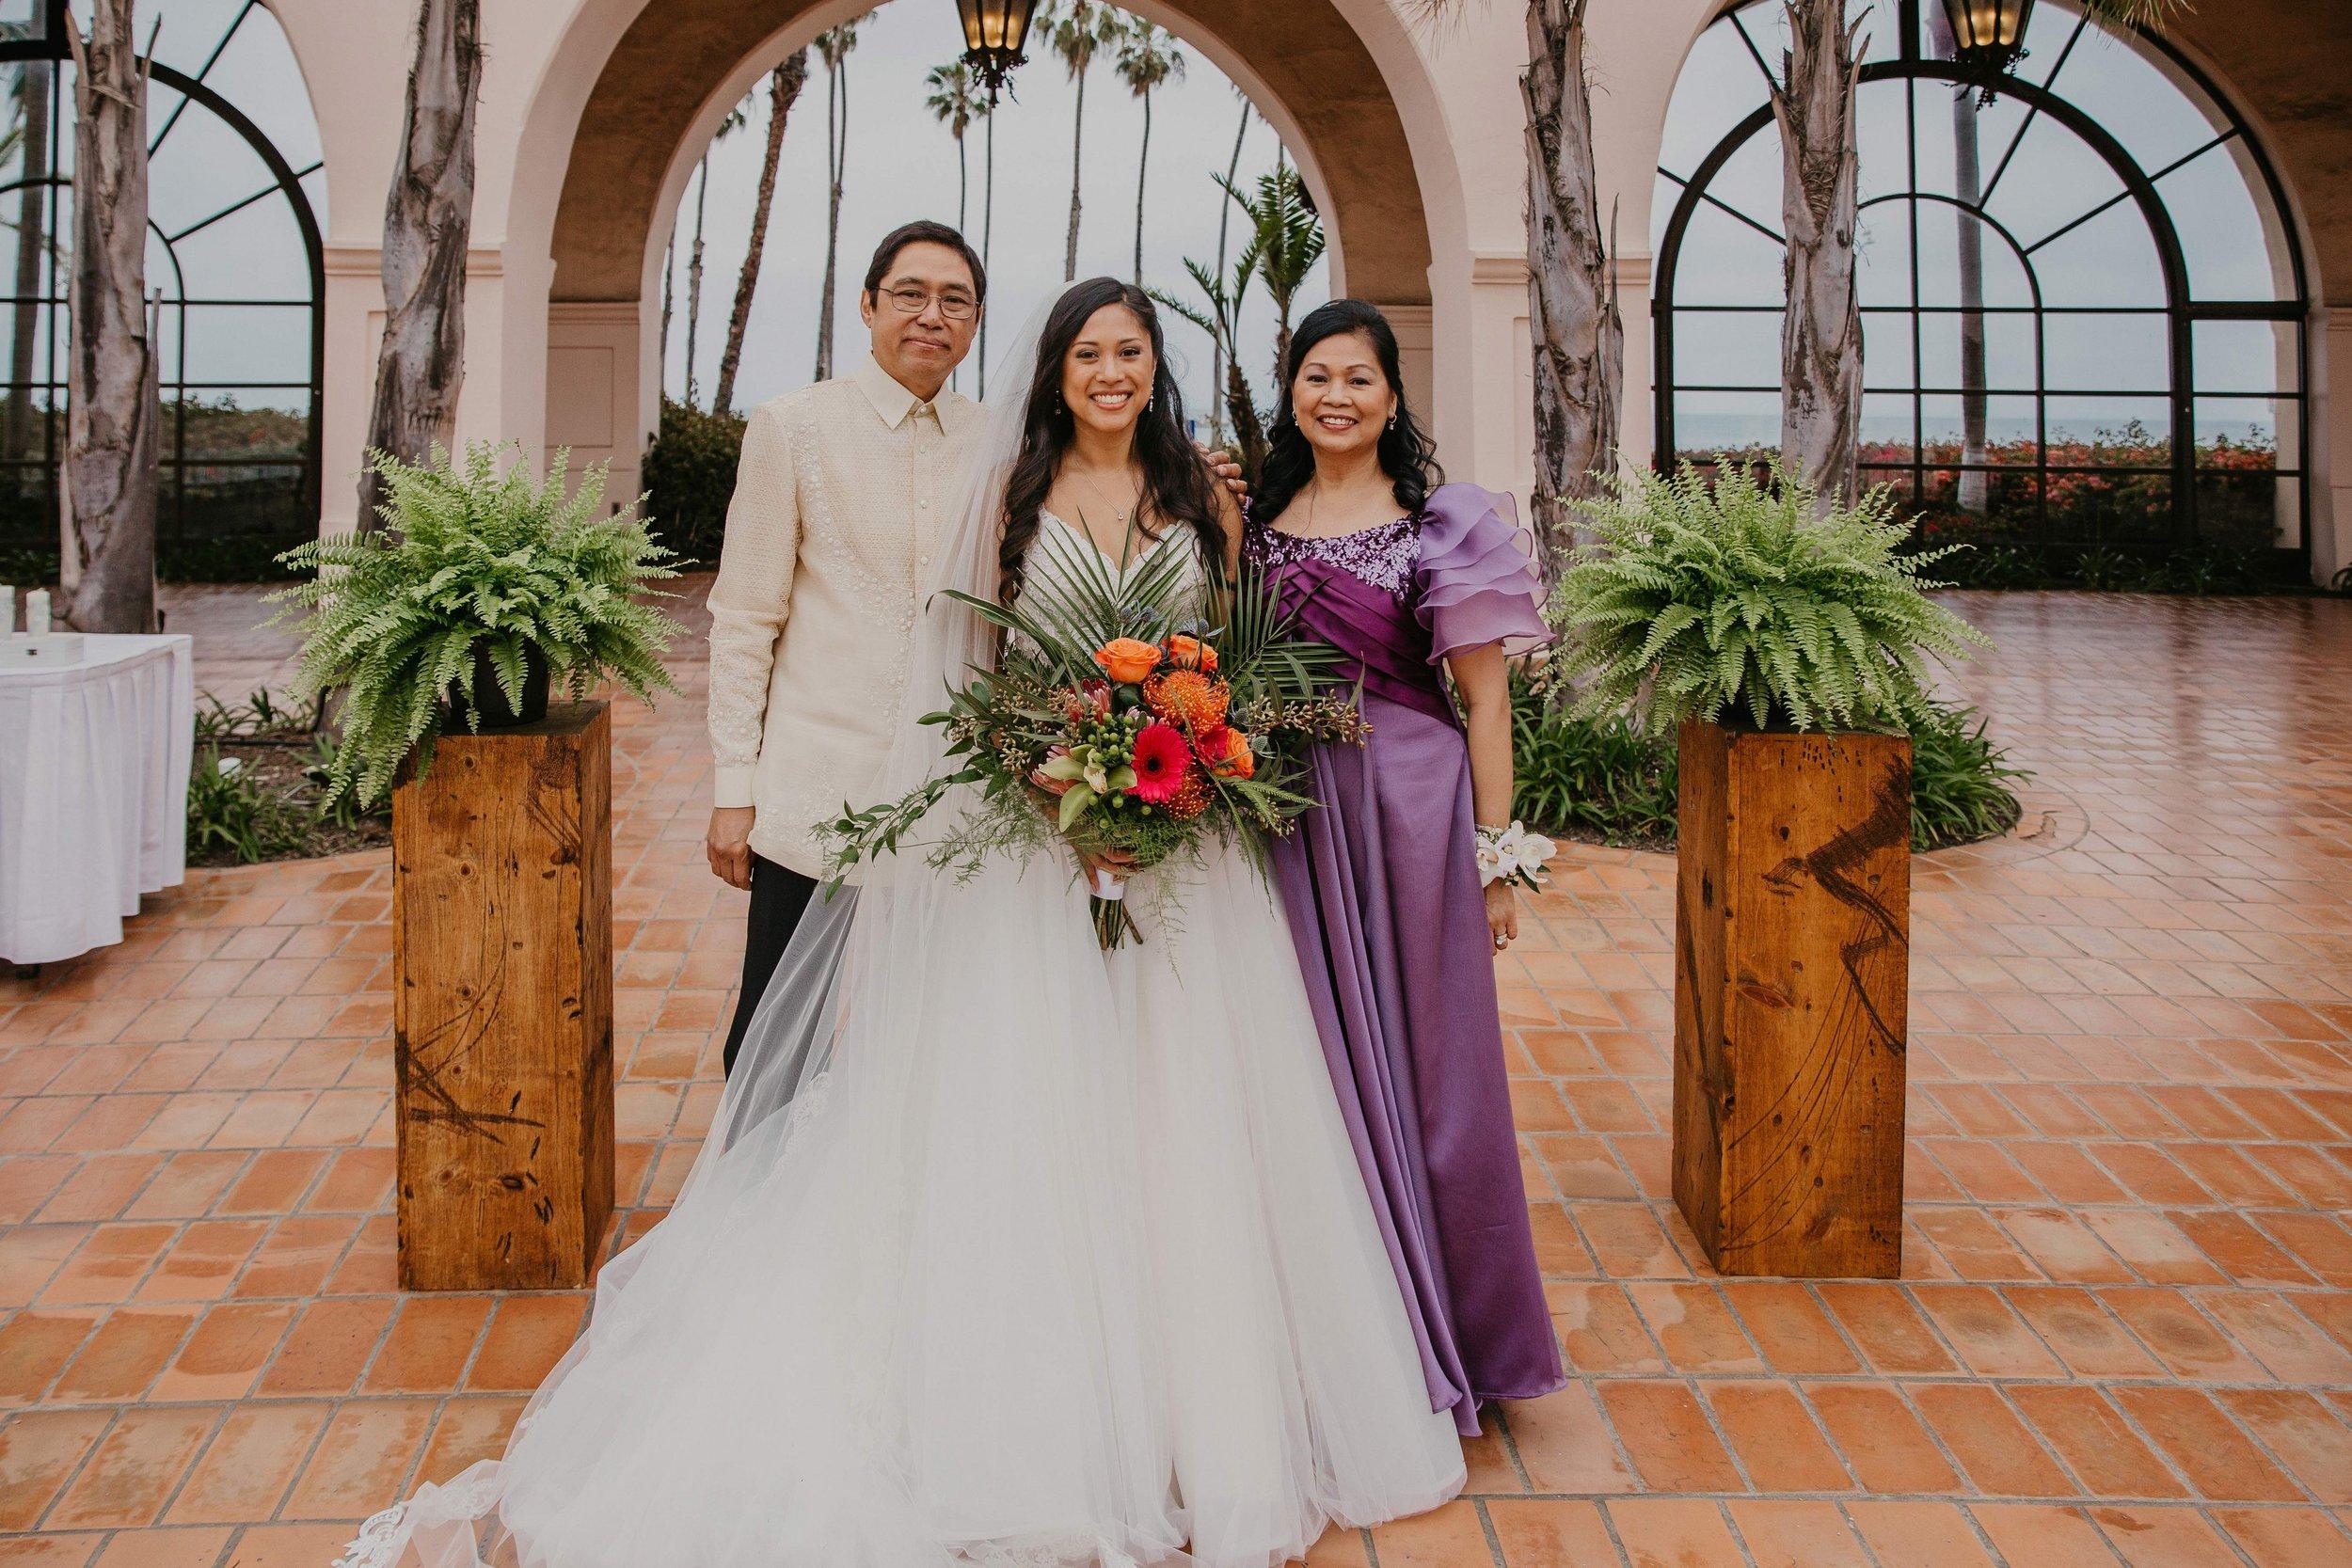 www.santabarbarawedding.com | Candice Marie Photography | Hilton Santa Barbara Beachfront Resort | Dalina Klan | Once in a Lifetime Weddings | Alpha Floral | Bride with Parents